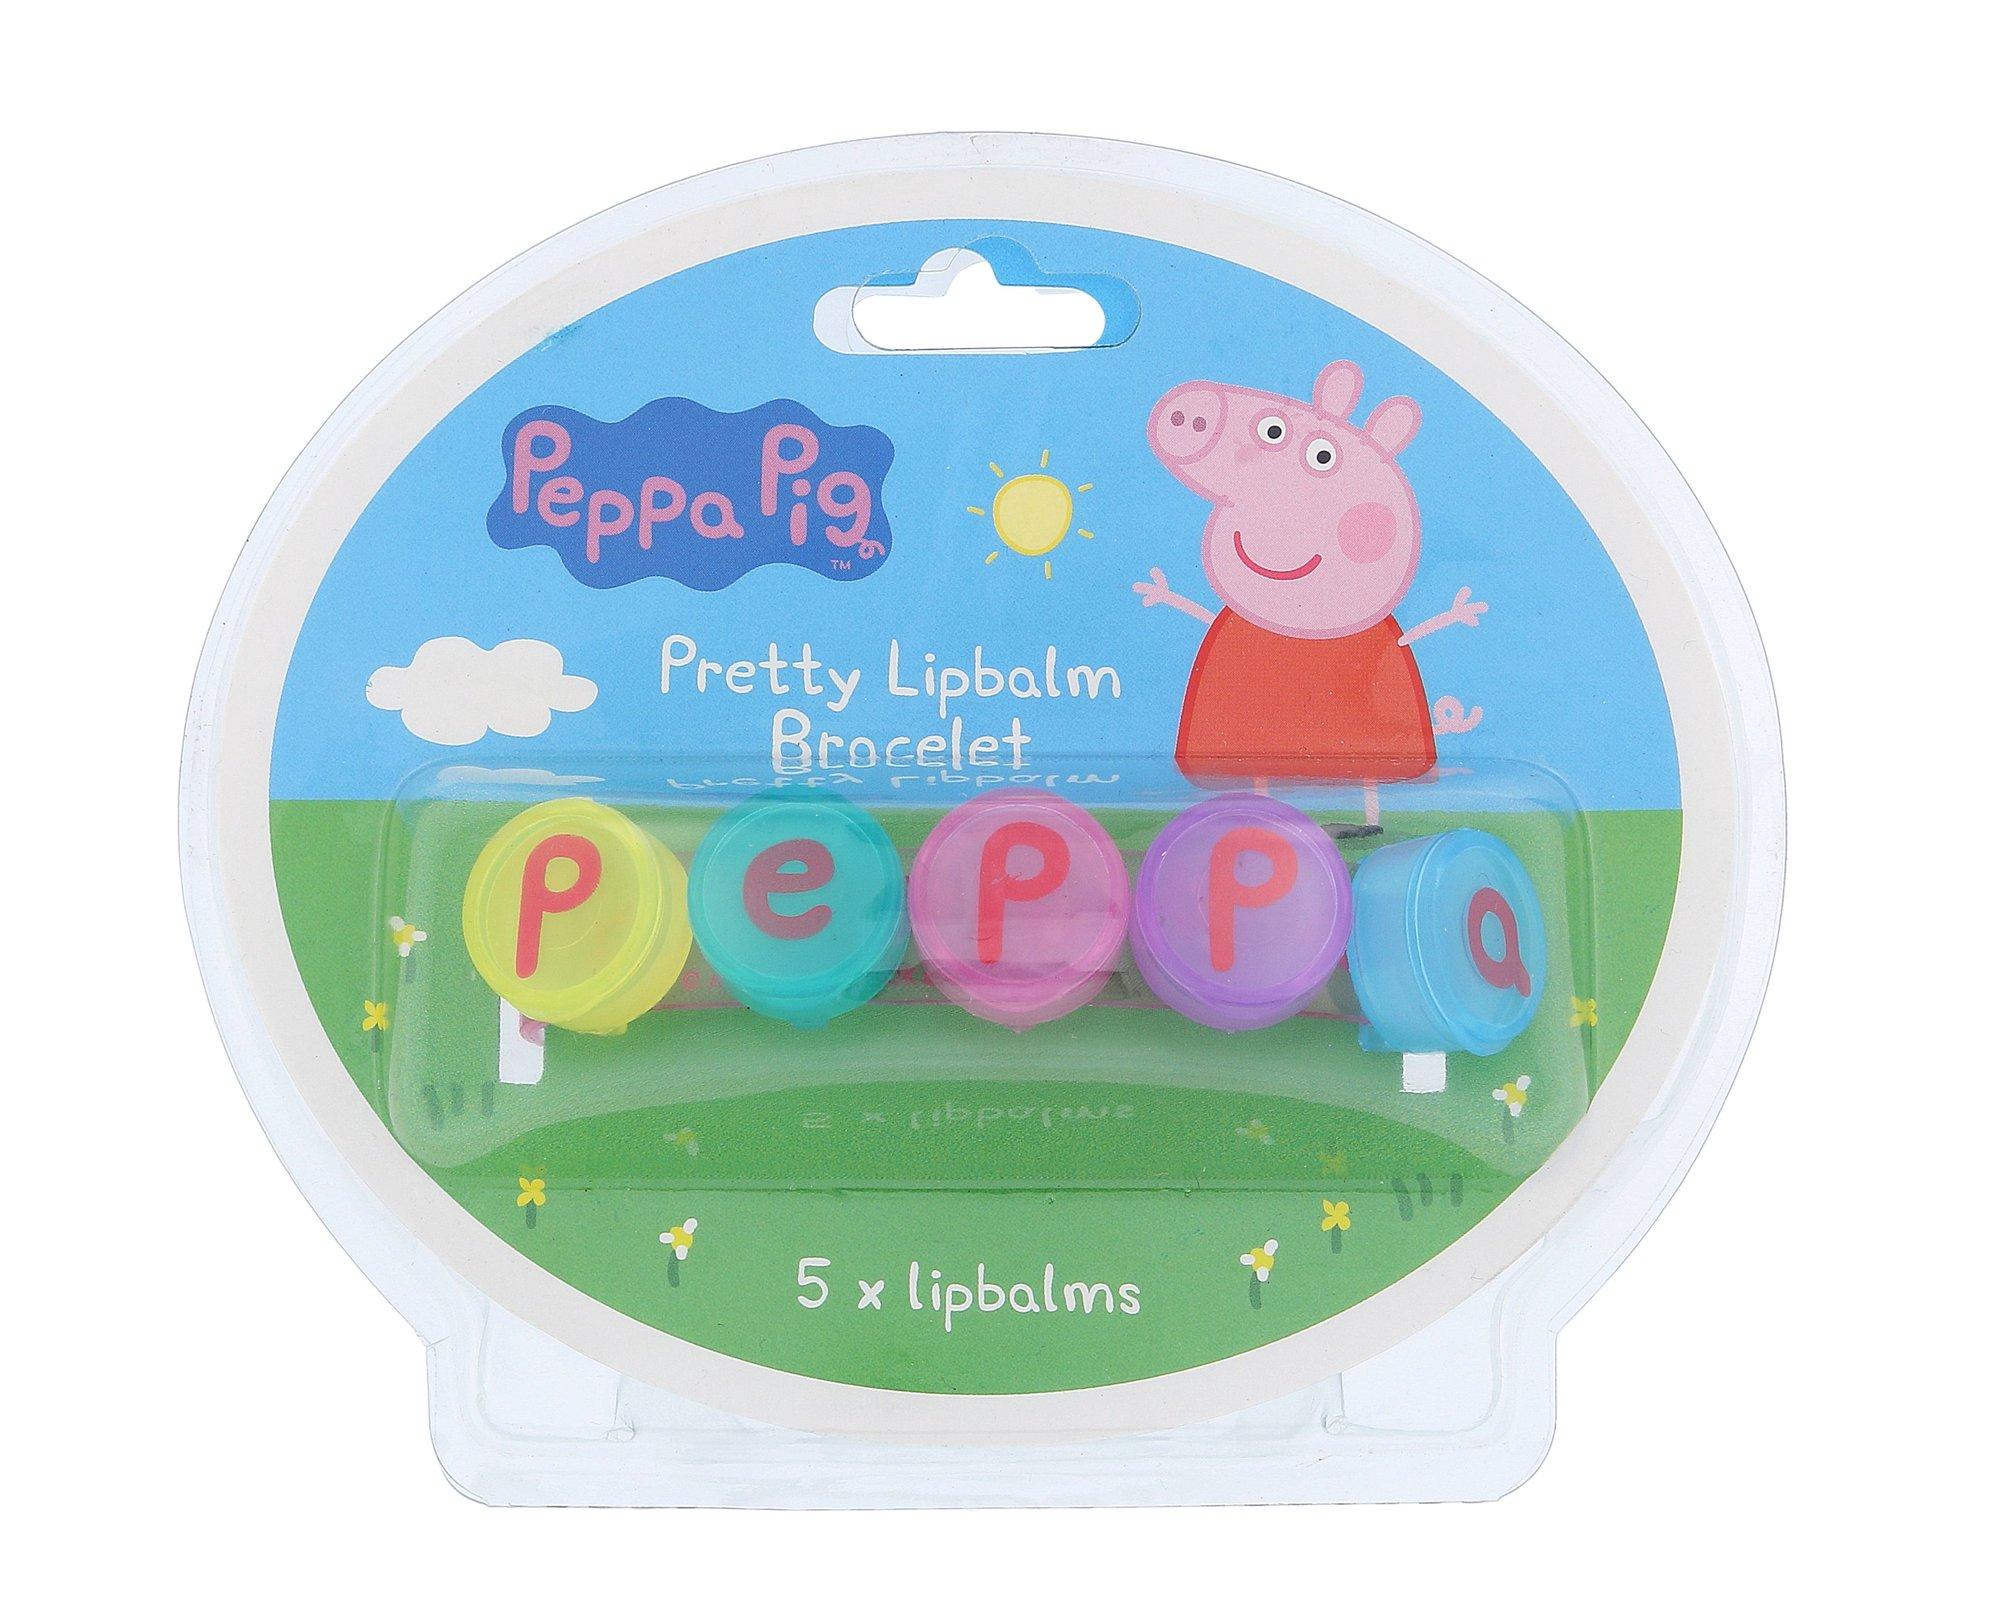 Peppa Pig Pretty Lipbalm Bracelet Cosmetic 5x1g